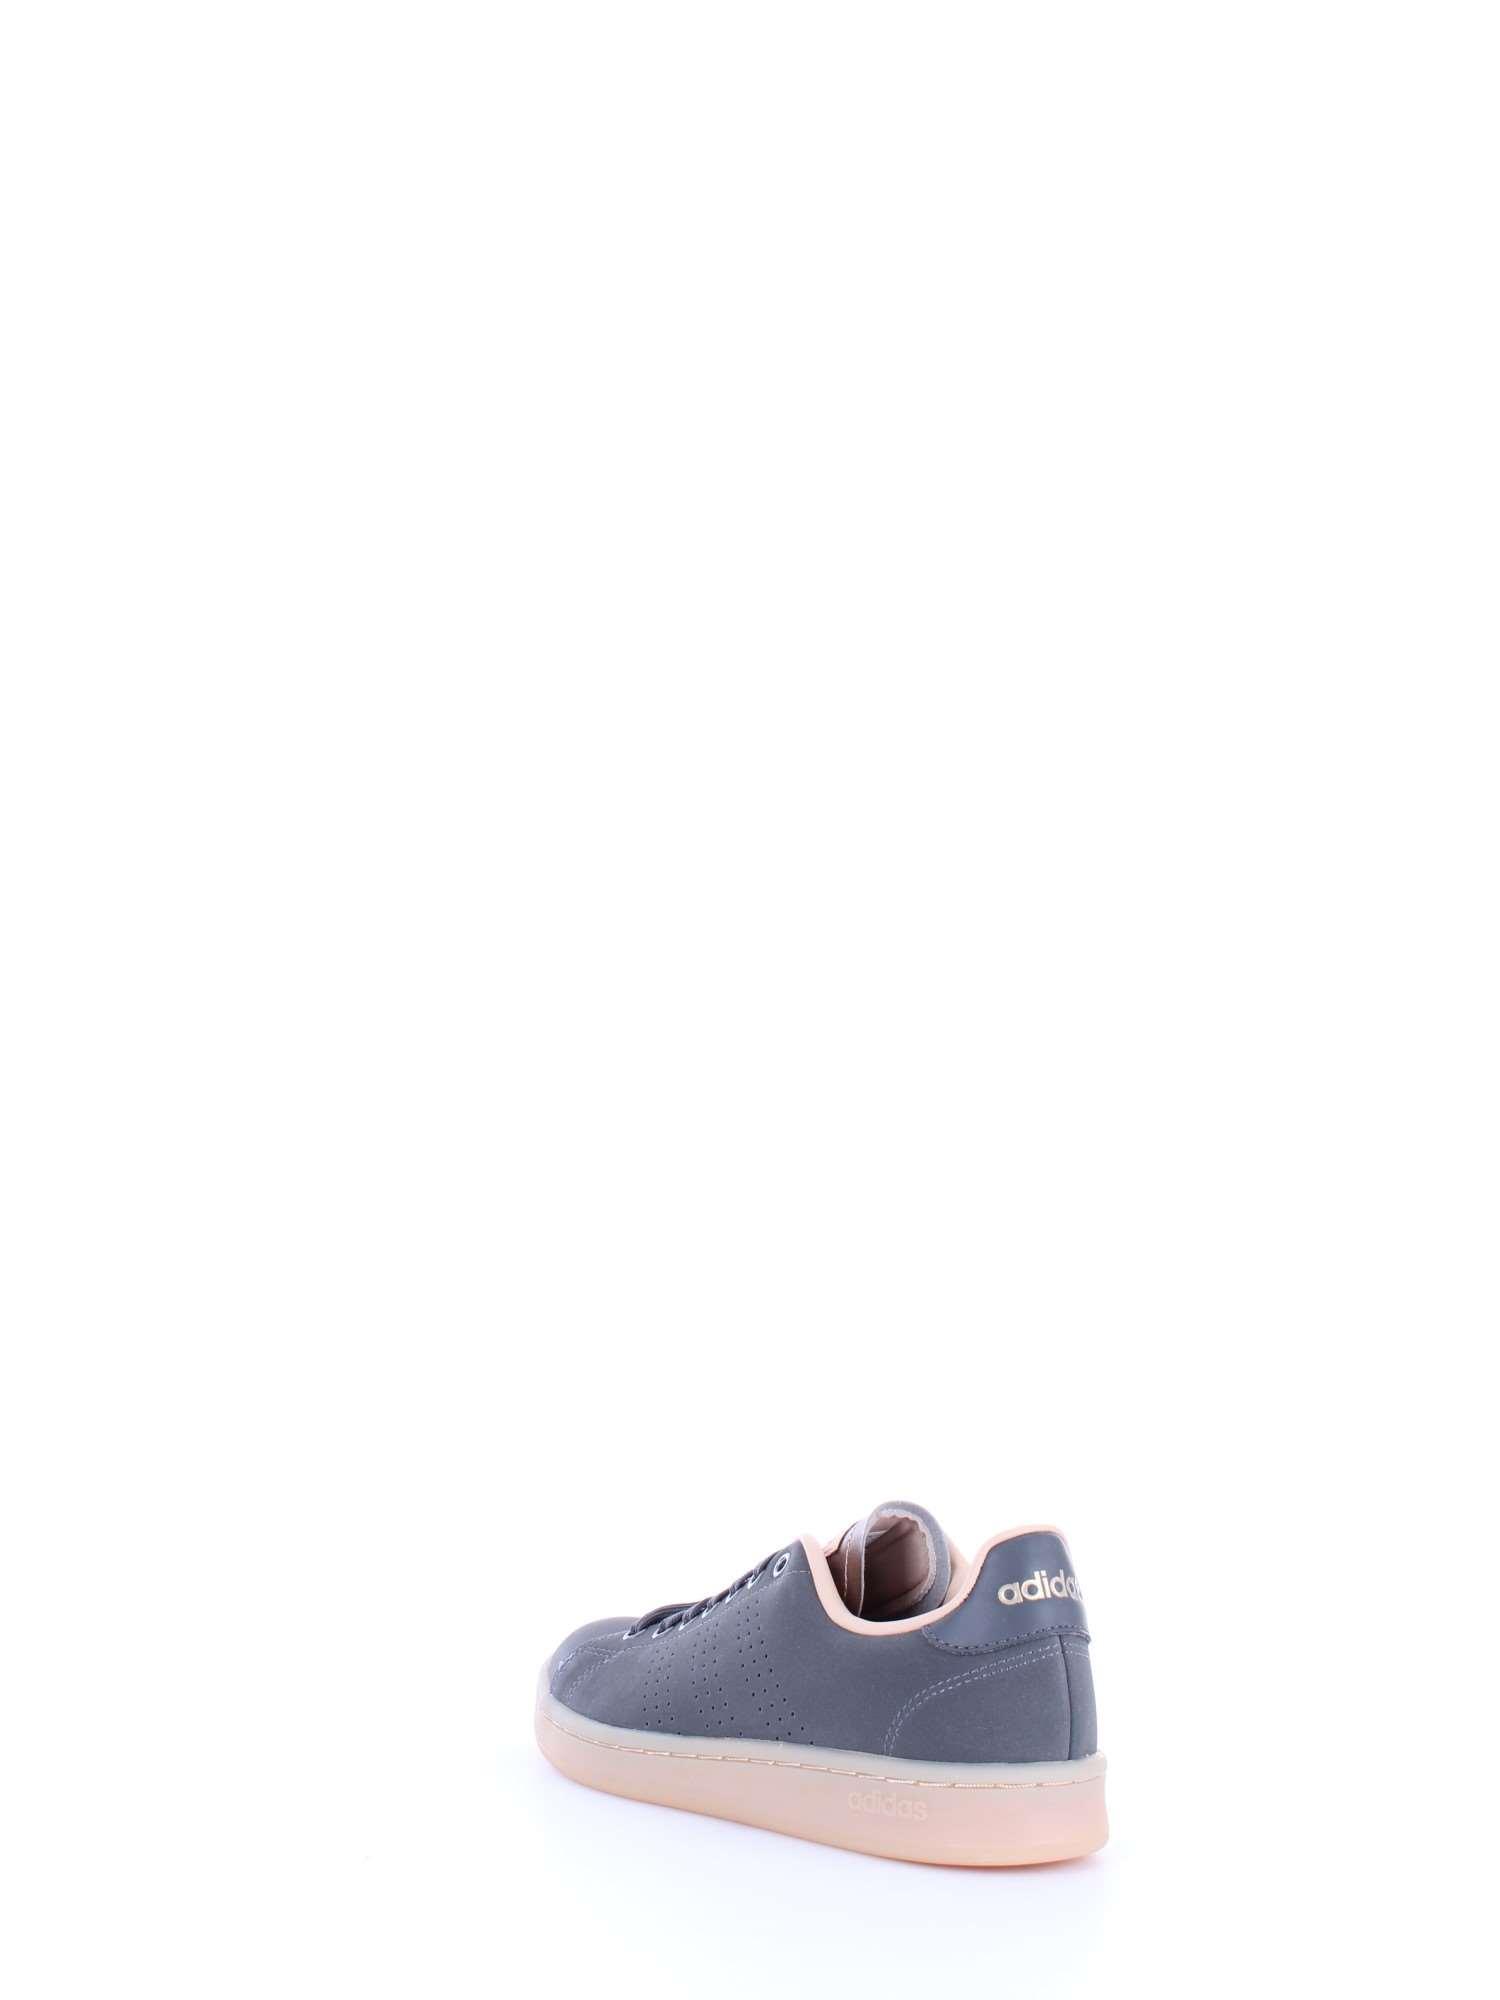 Advantage grey F37043 Nude Sneakers Rosa Pale Donna Grigio Six Adidas New w6RqEpEX